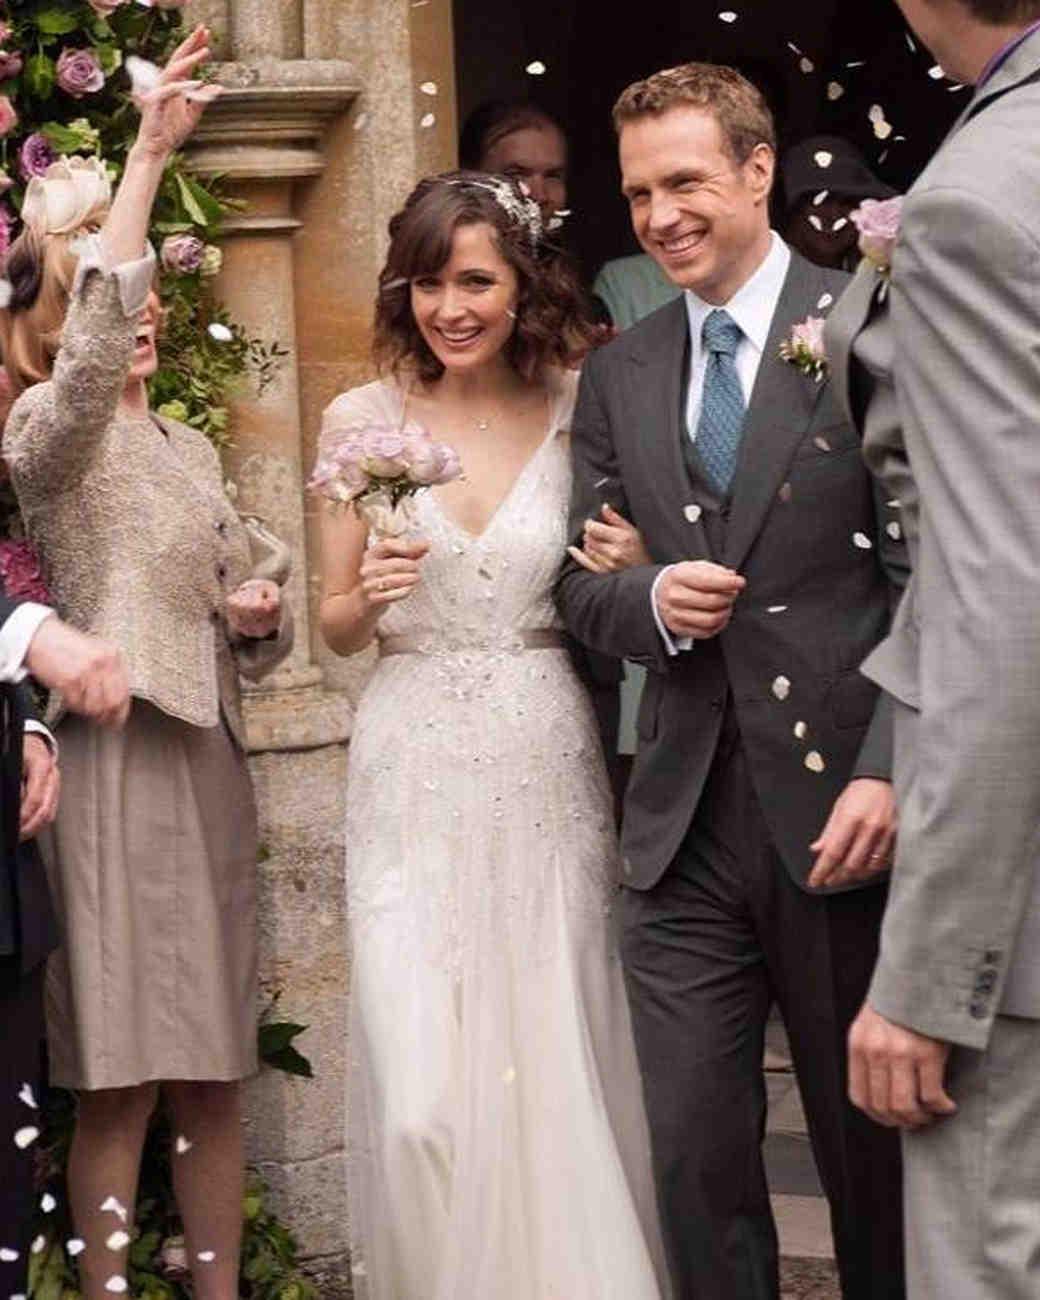 movie-wedding-dresses-i-give-it-a-year-rose-byrne-0316.jpg